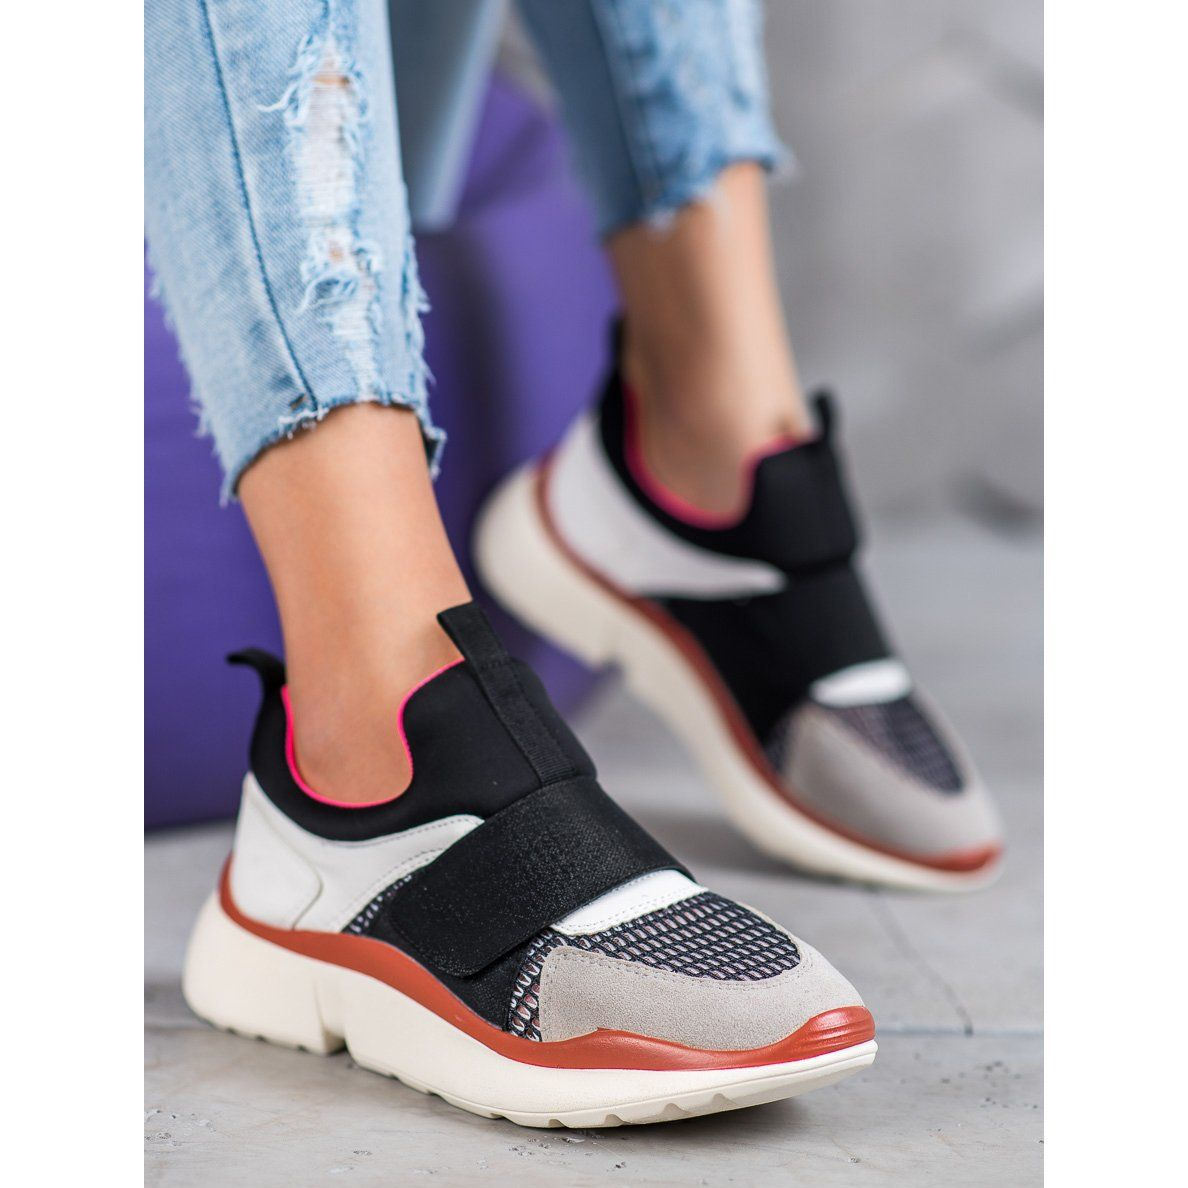 Sweet Shoes Lekkie Buty Sportowe Na Rzep Wielokolorowe Sneakers Shoes Balenciaga